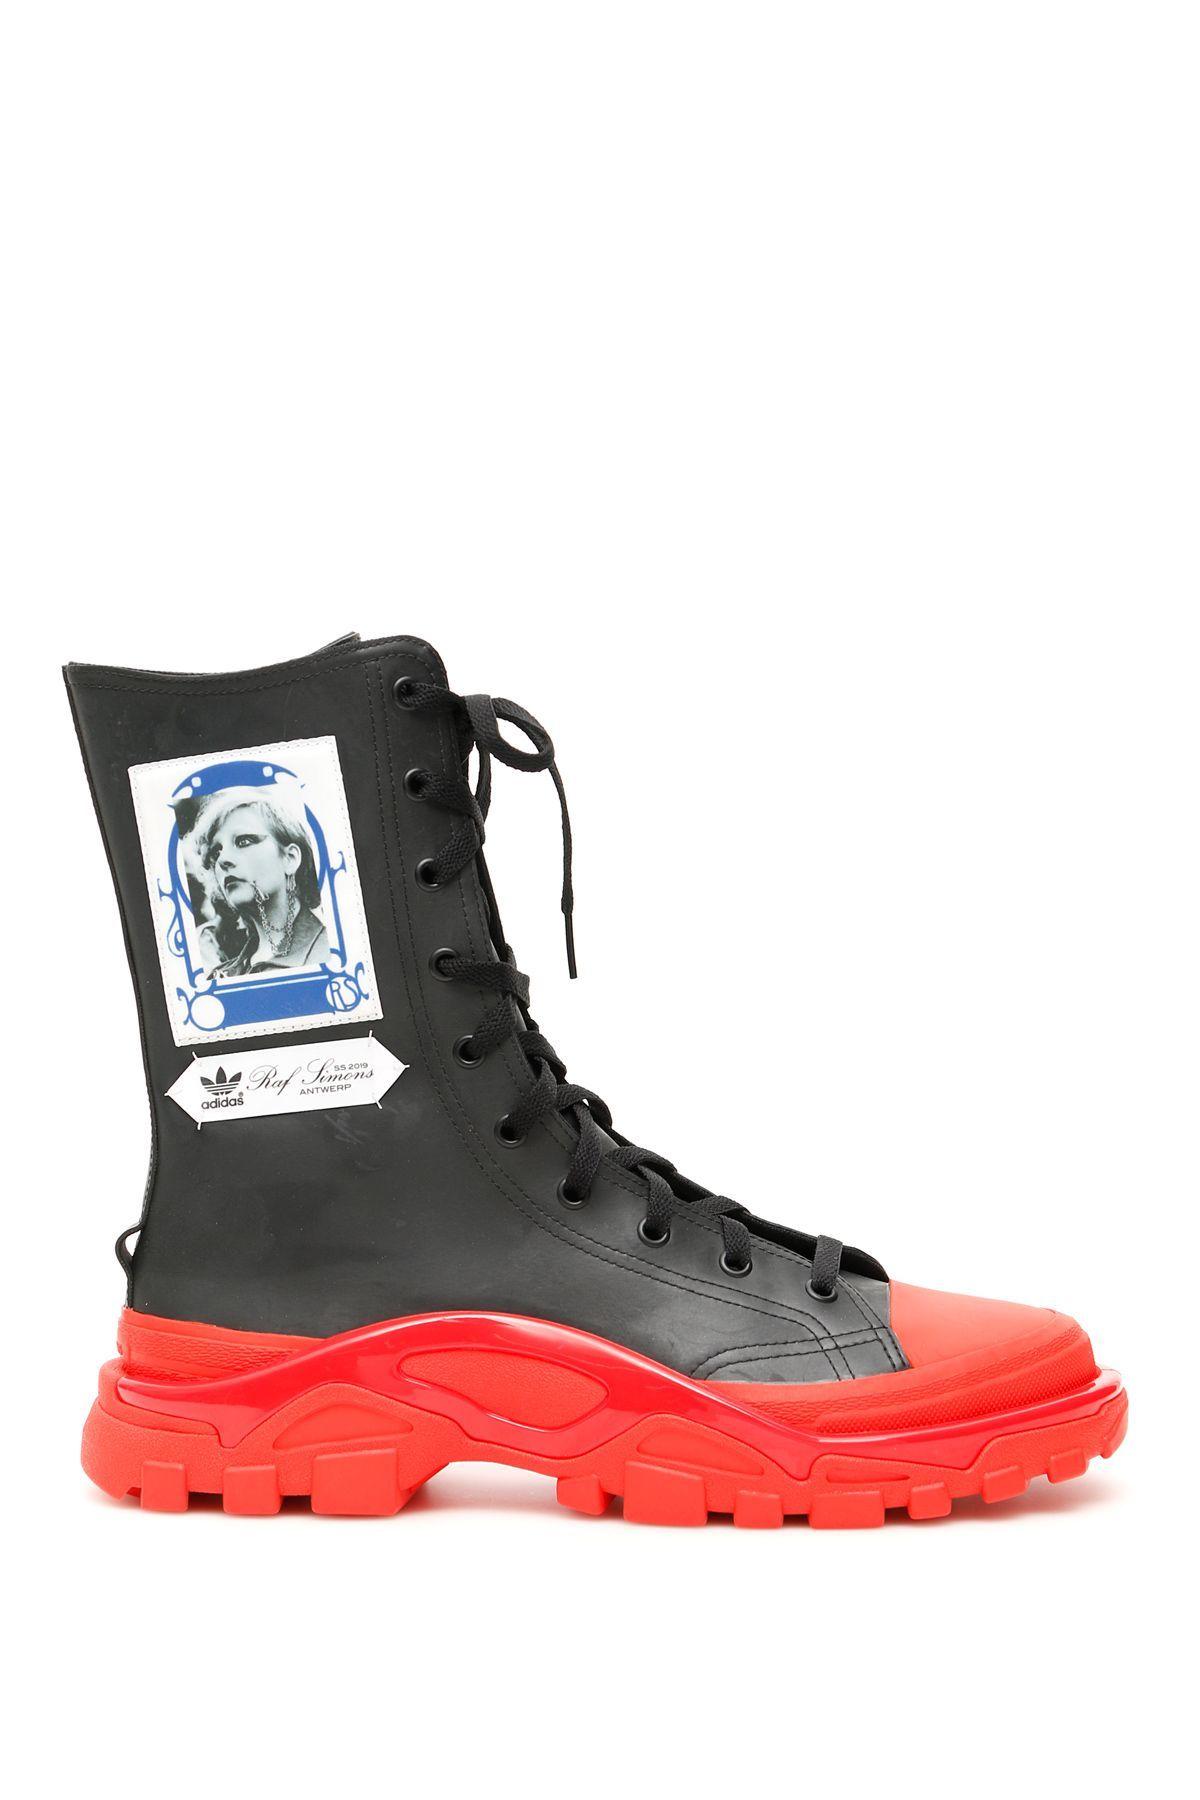 Raf simons adidas, High sneakers, Raf